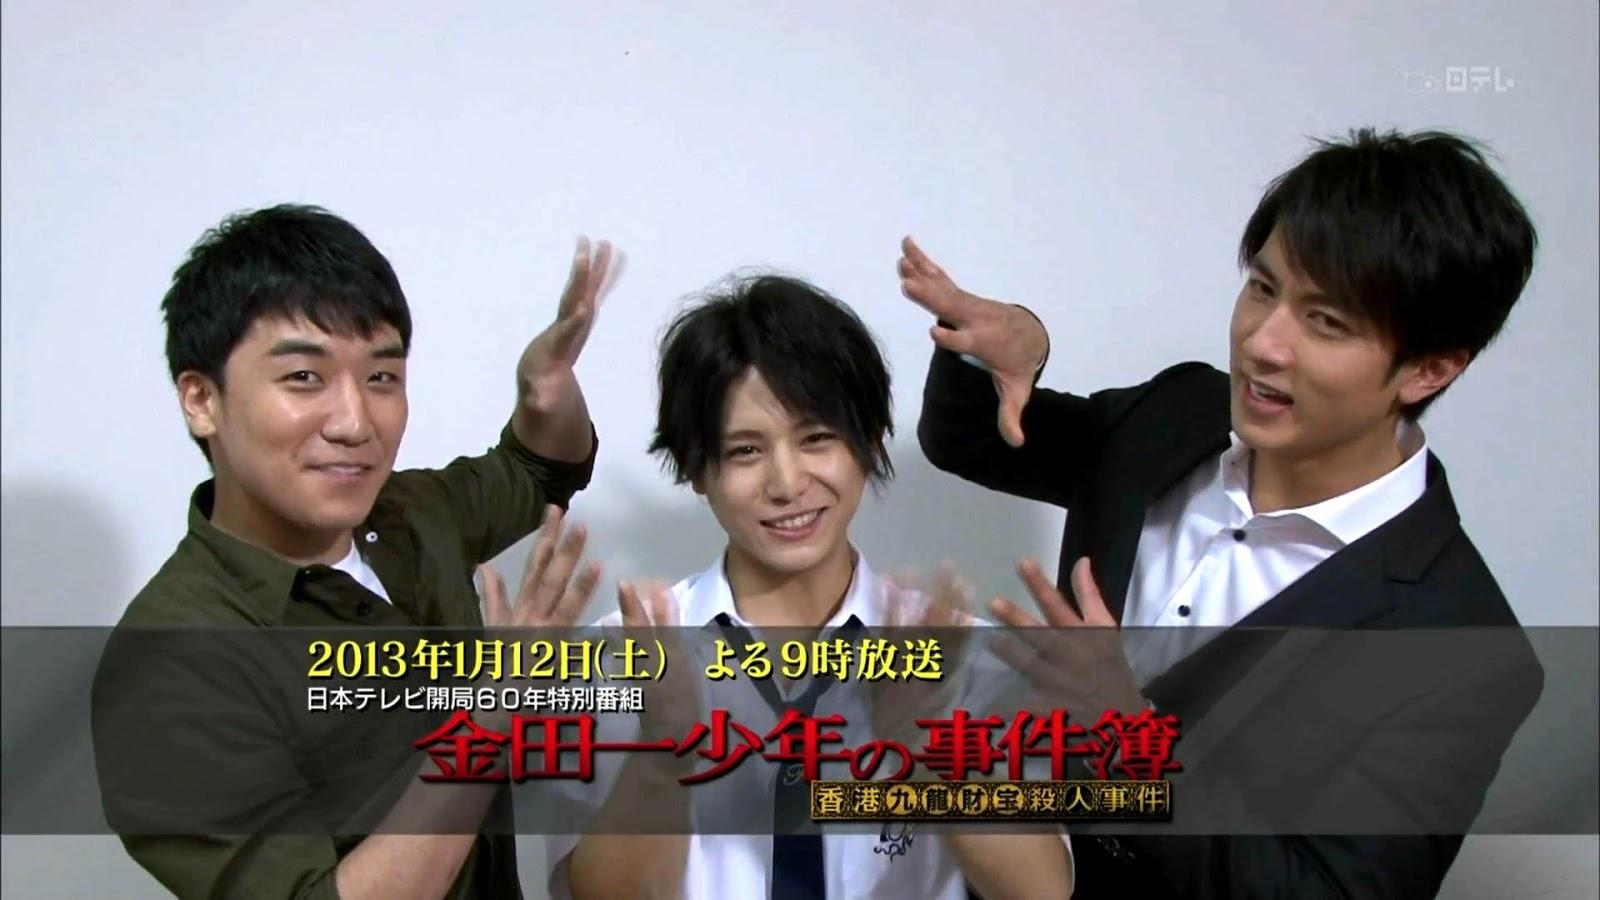 Yamada Ryosuke And Seungri 2013 01 10 yamada ryosuke  v i   seungri    Yamada Ryosuke And Seungri